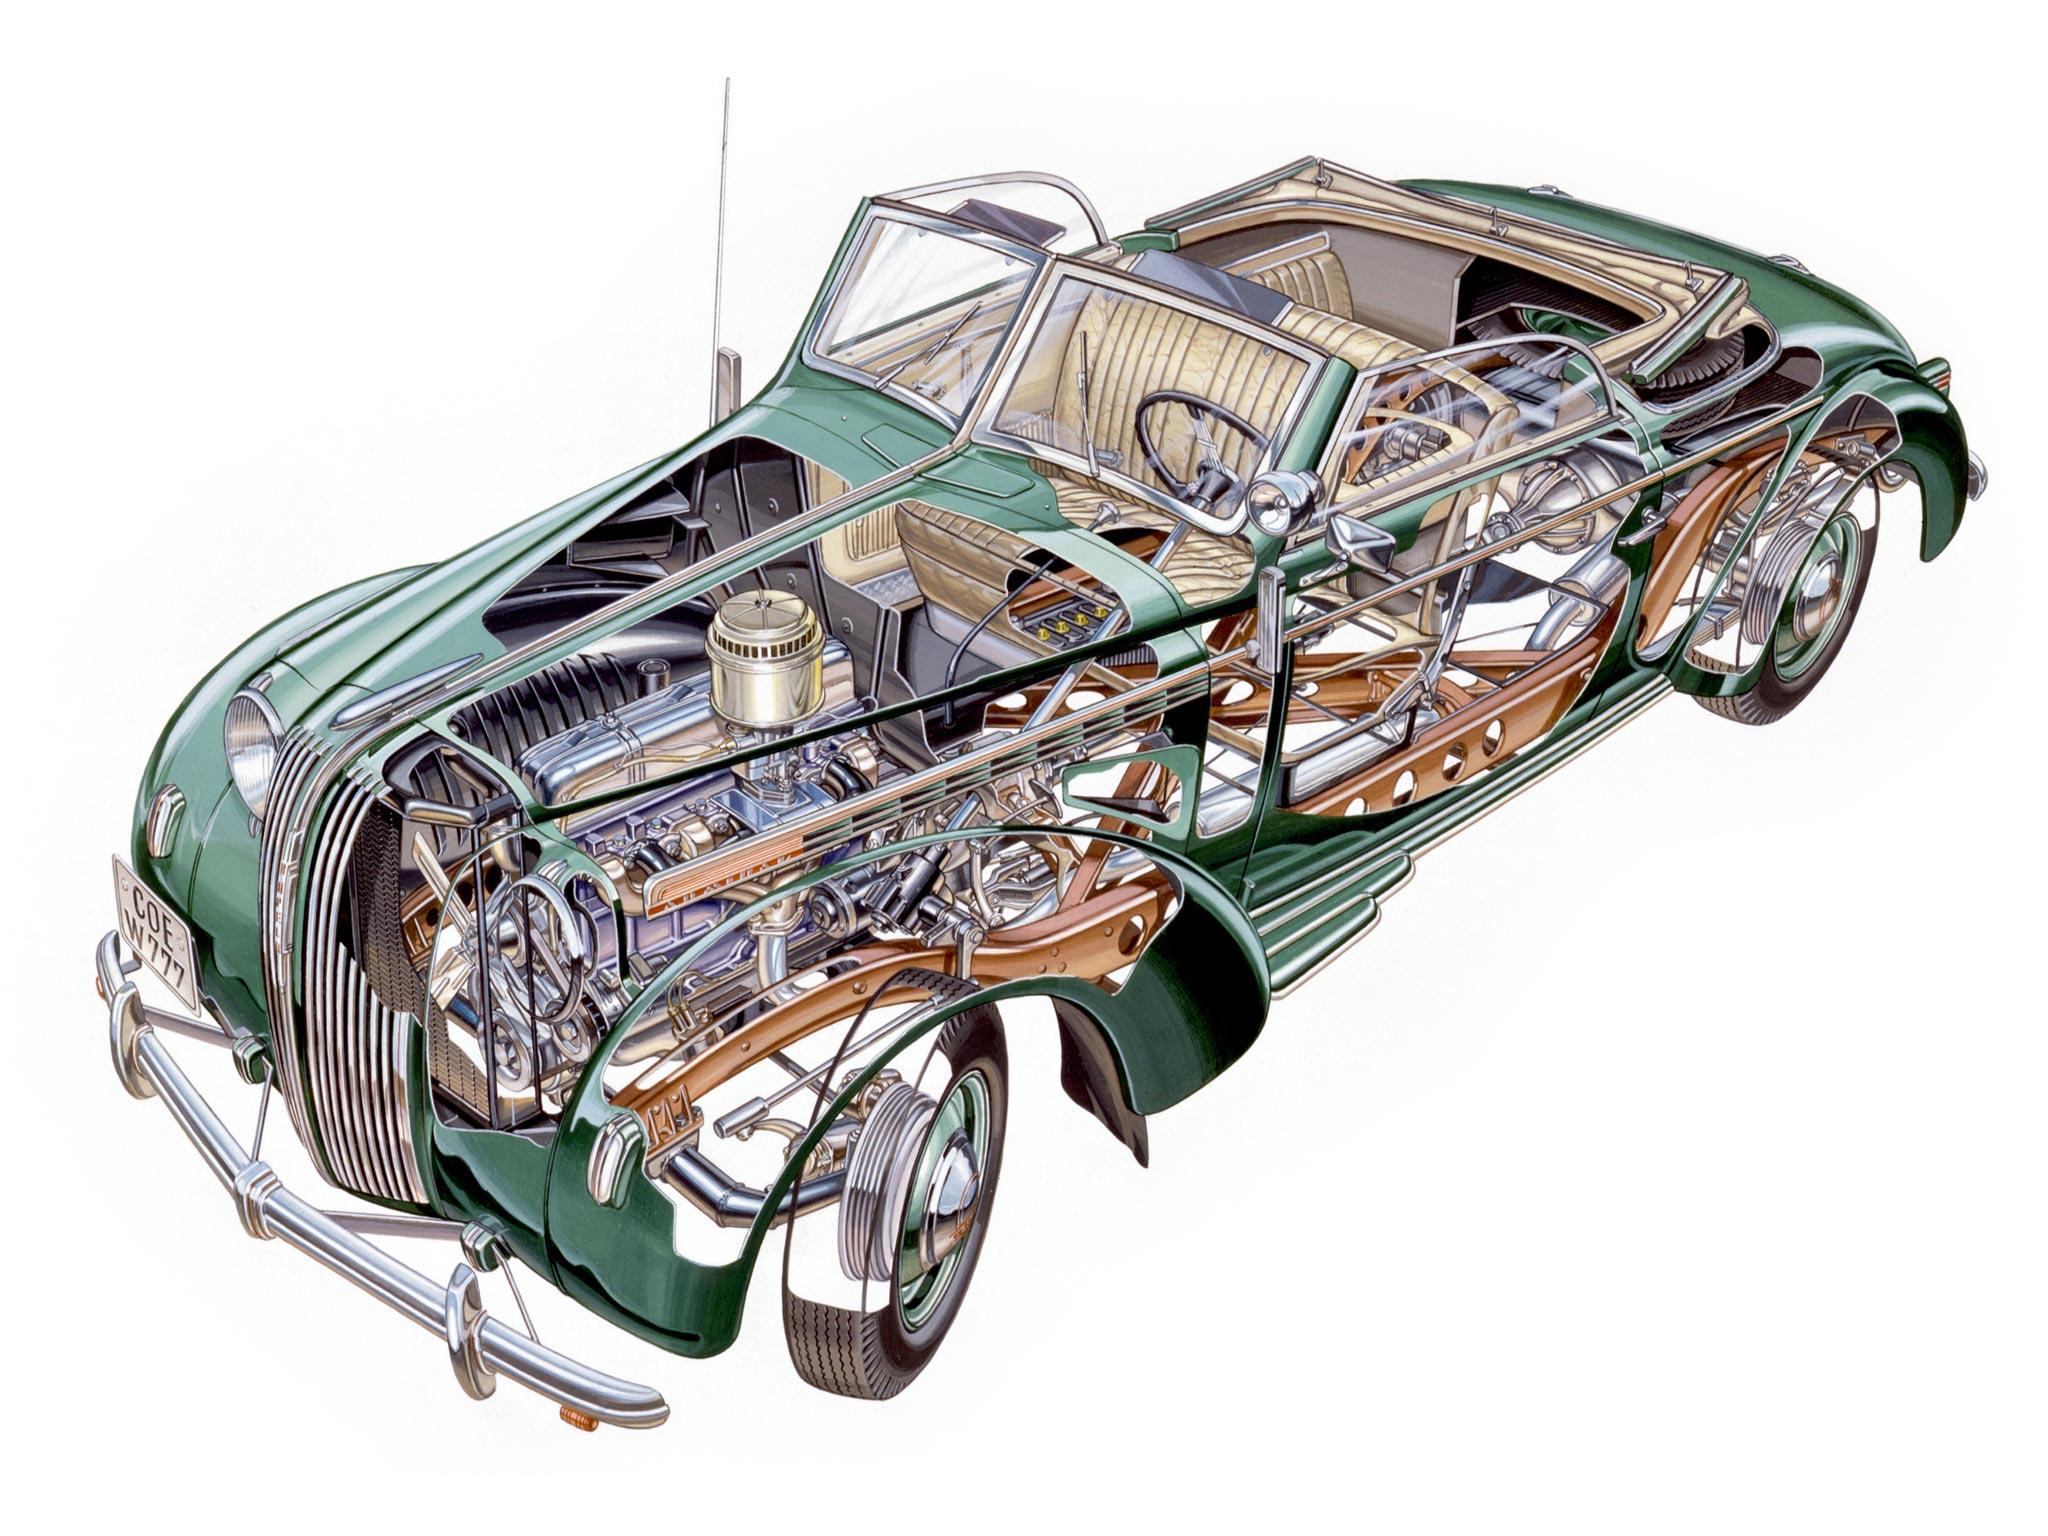 Opel Admiral cutaway drawing